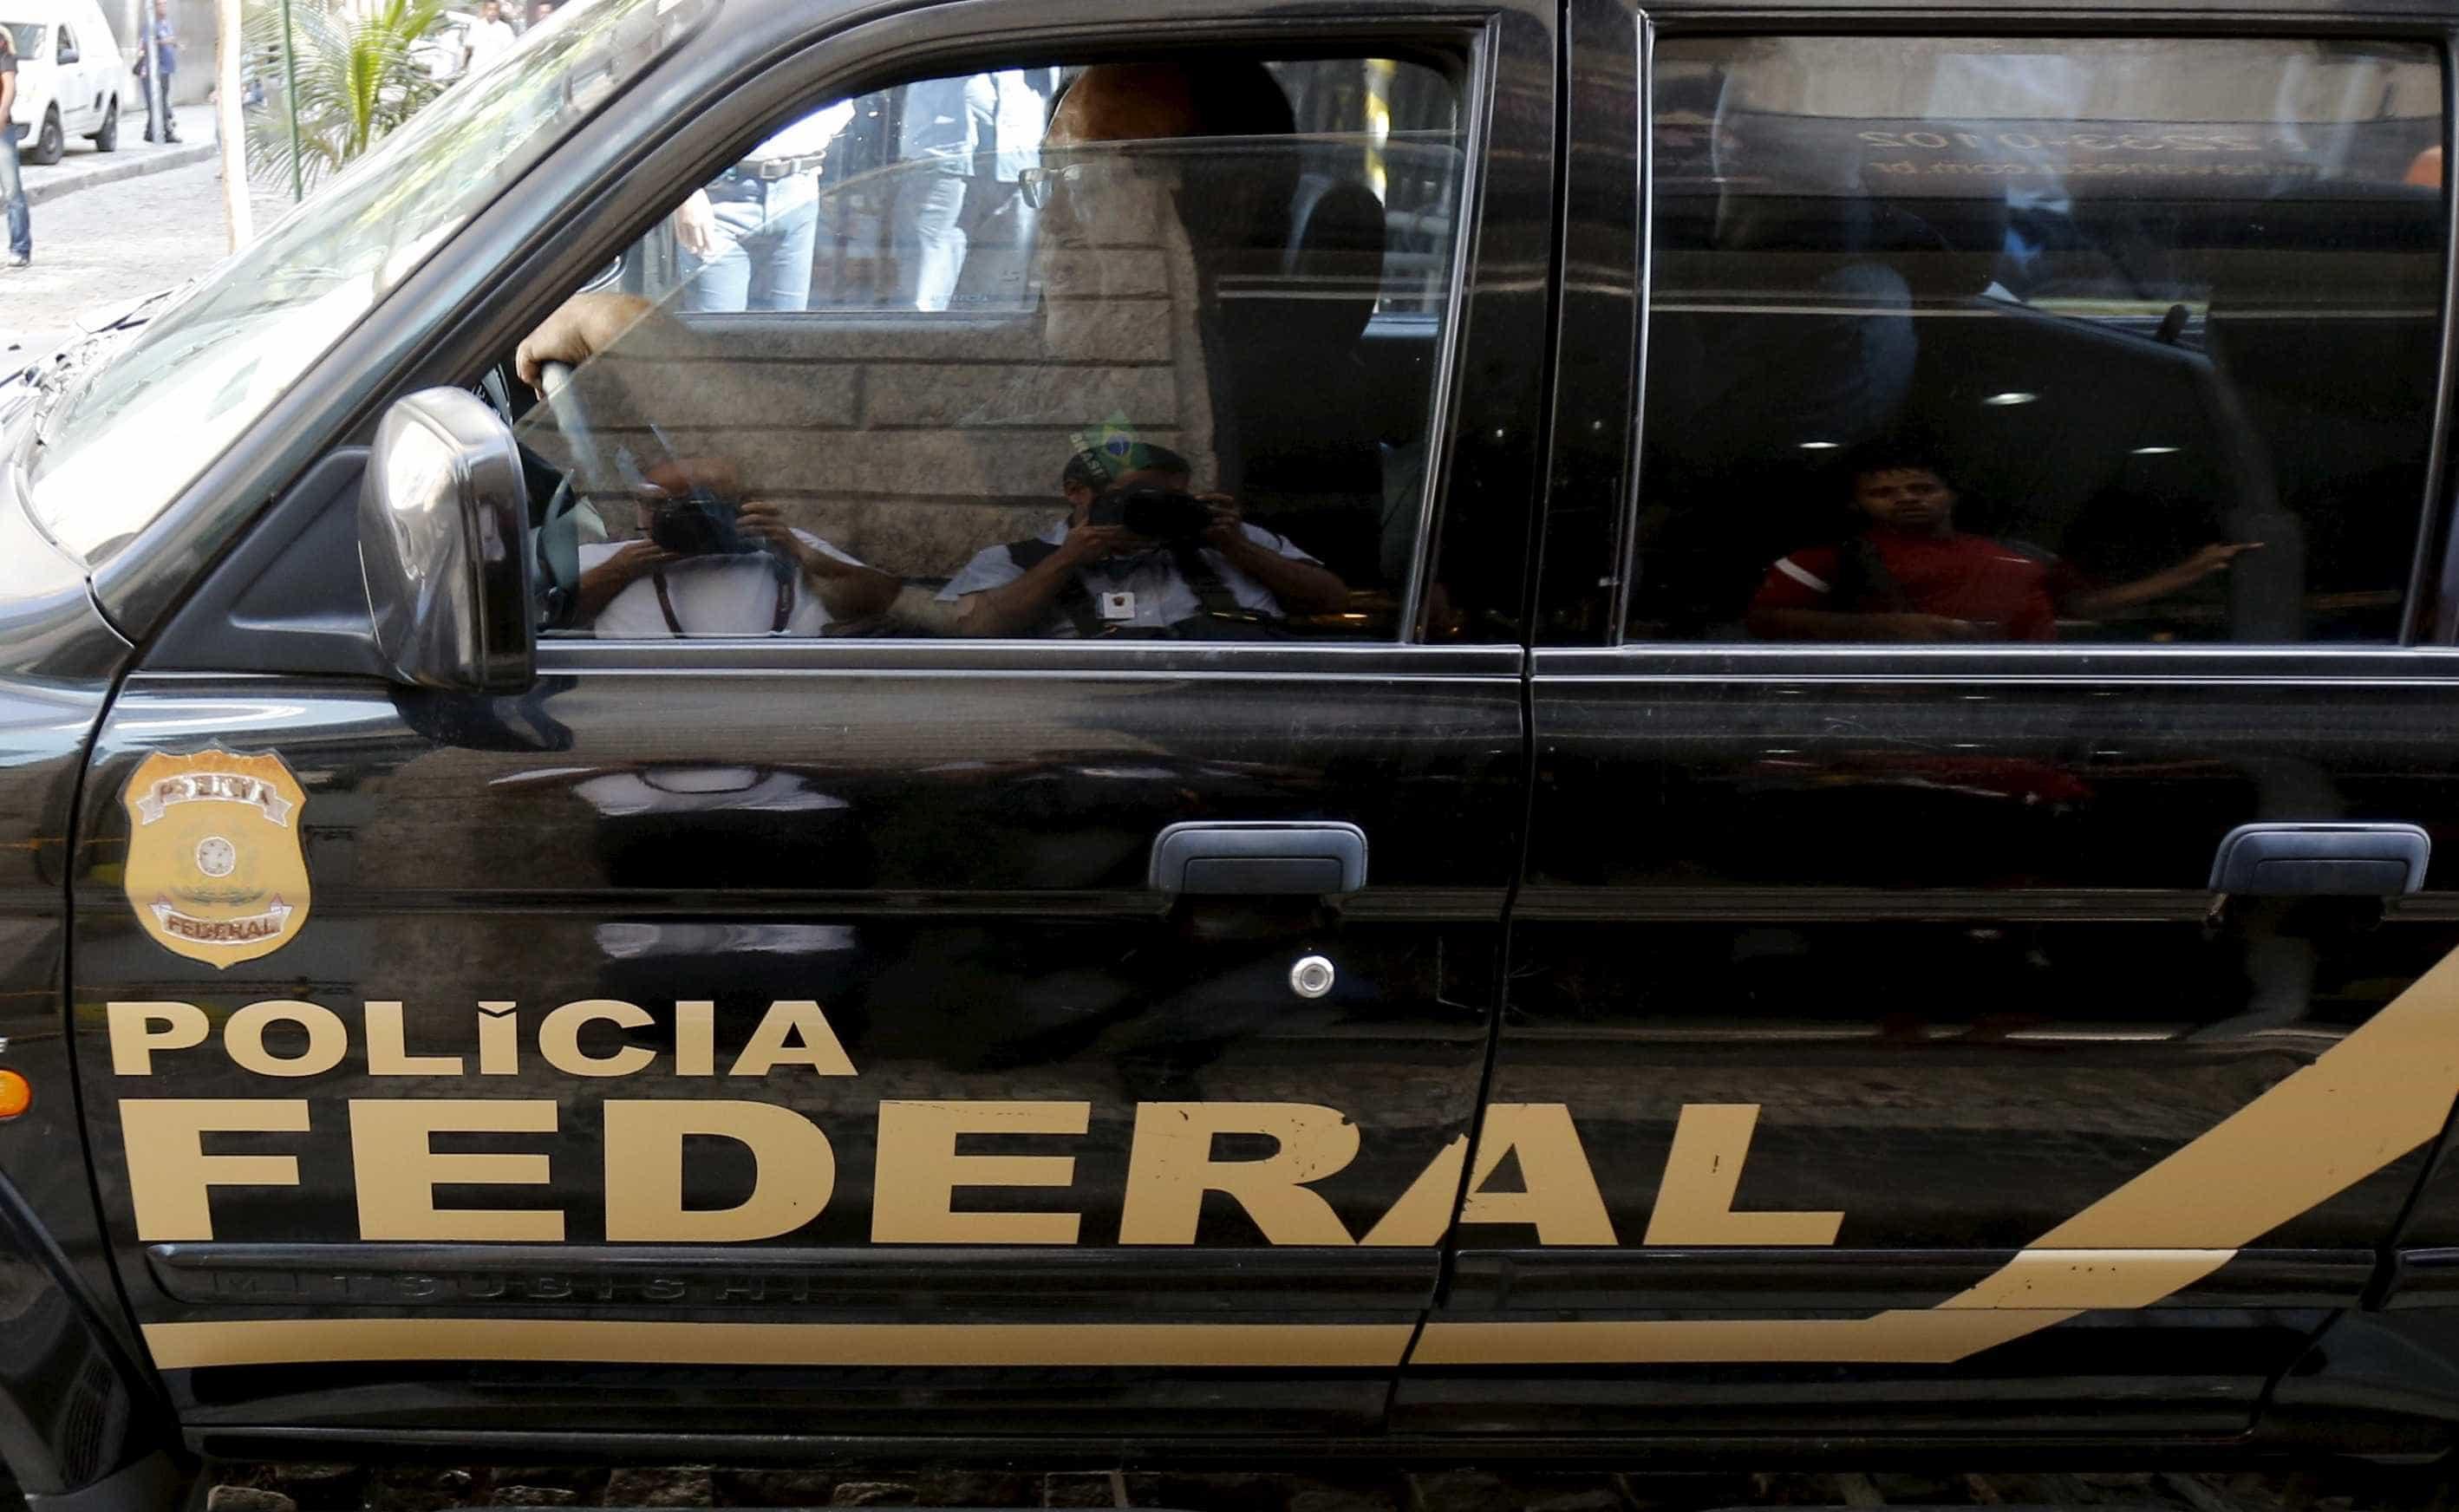 Filho de Bolsonaro namorou com filha de suspeito de homicídio de Marielle